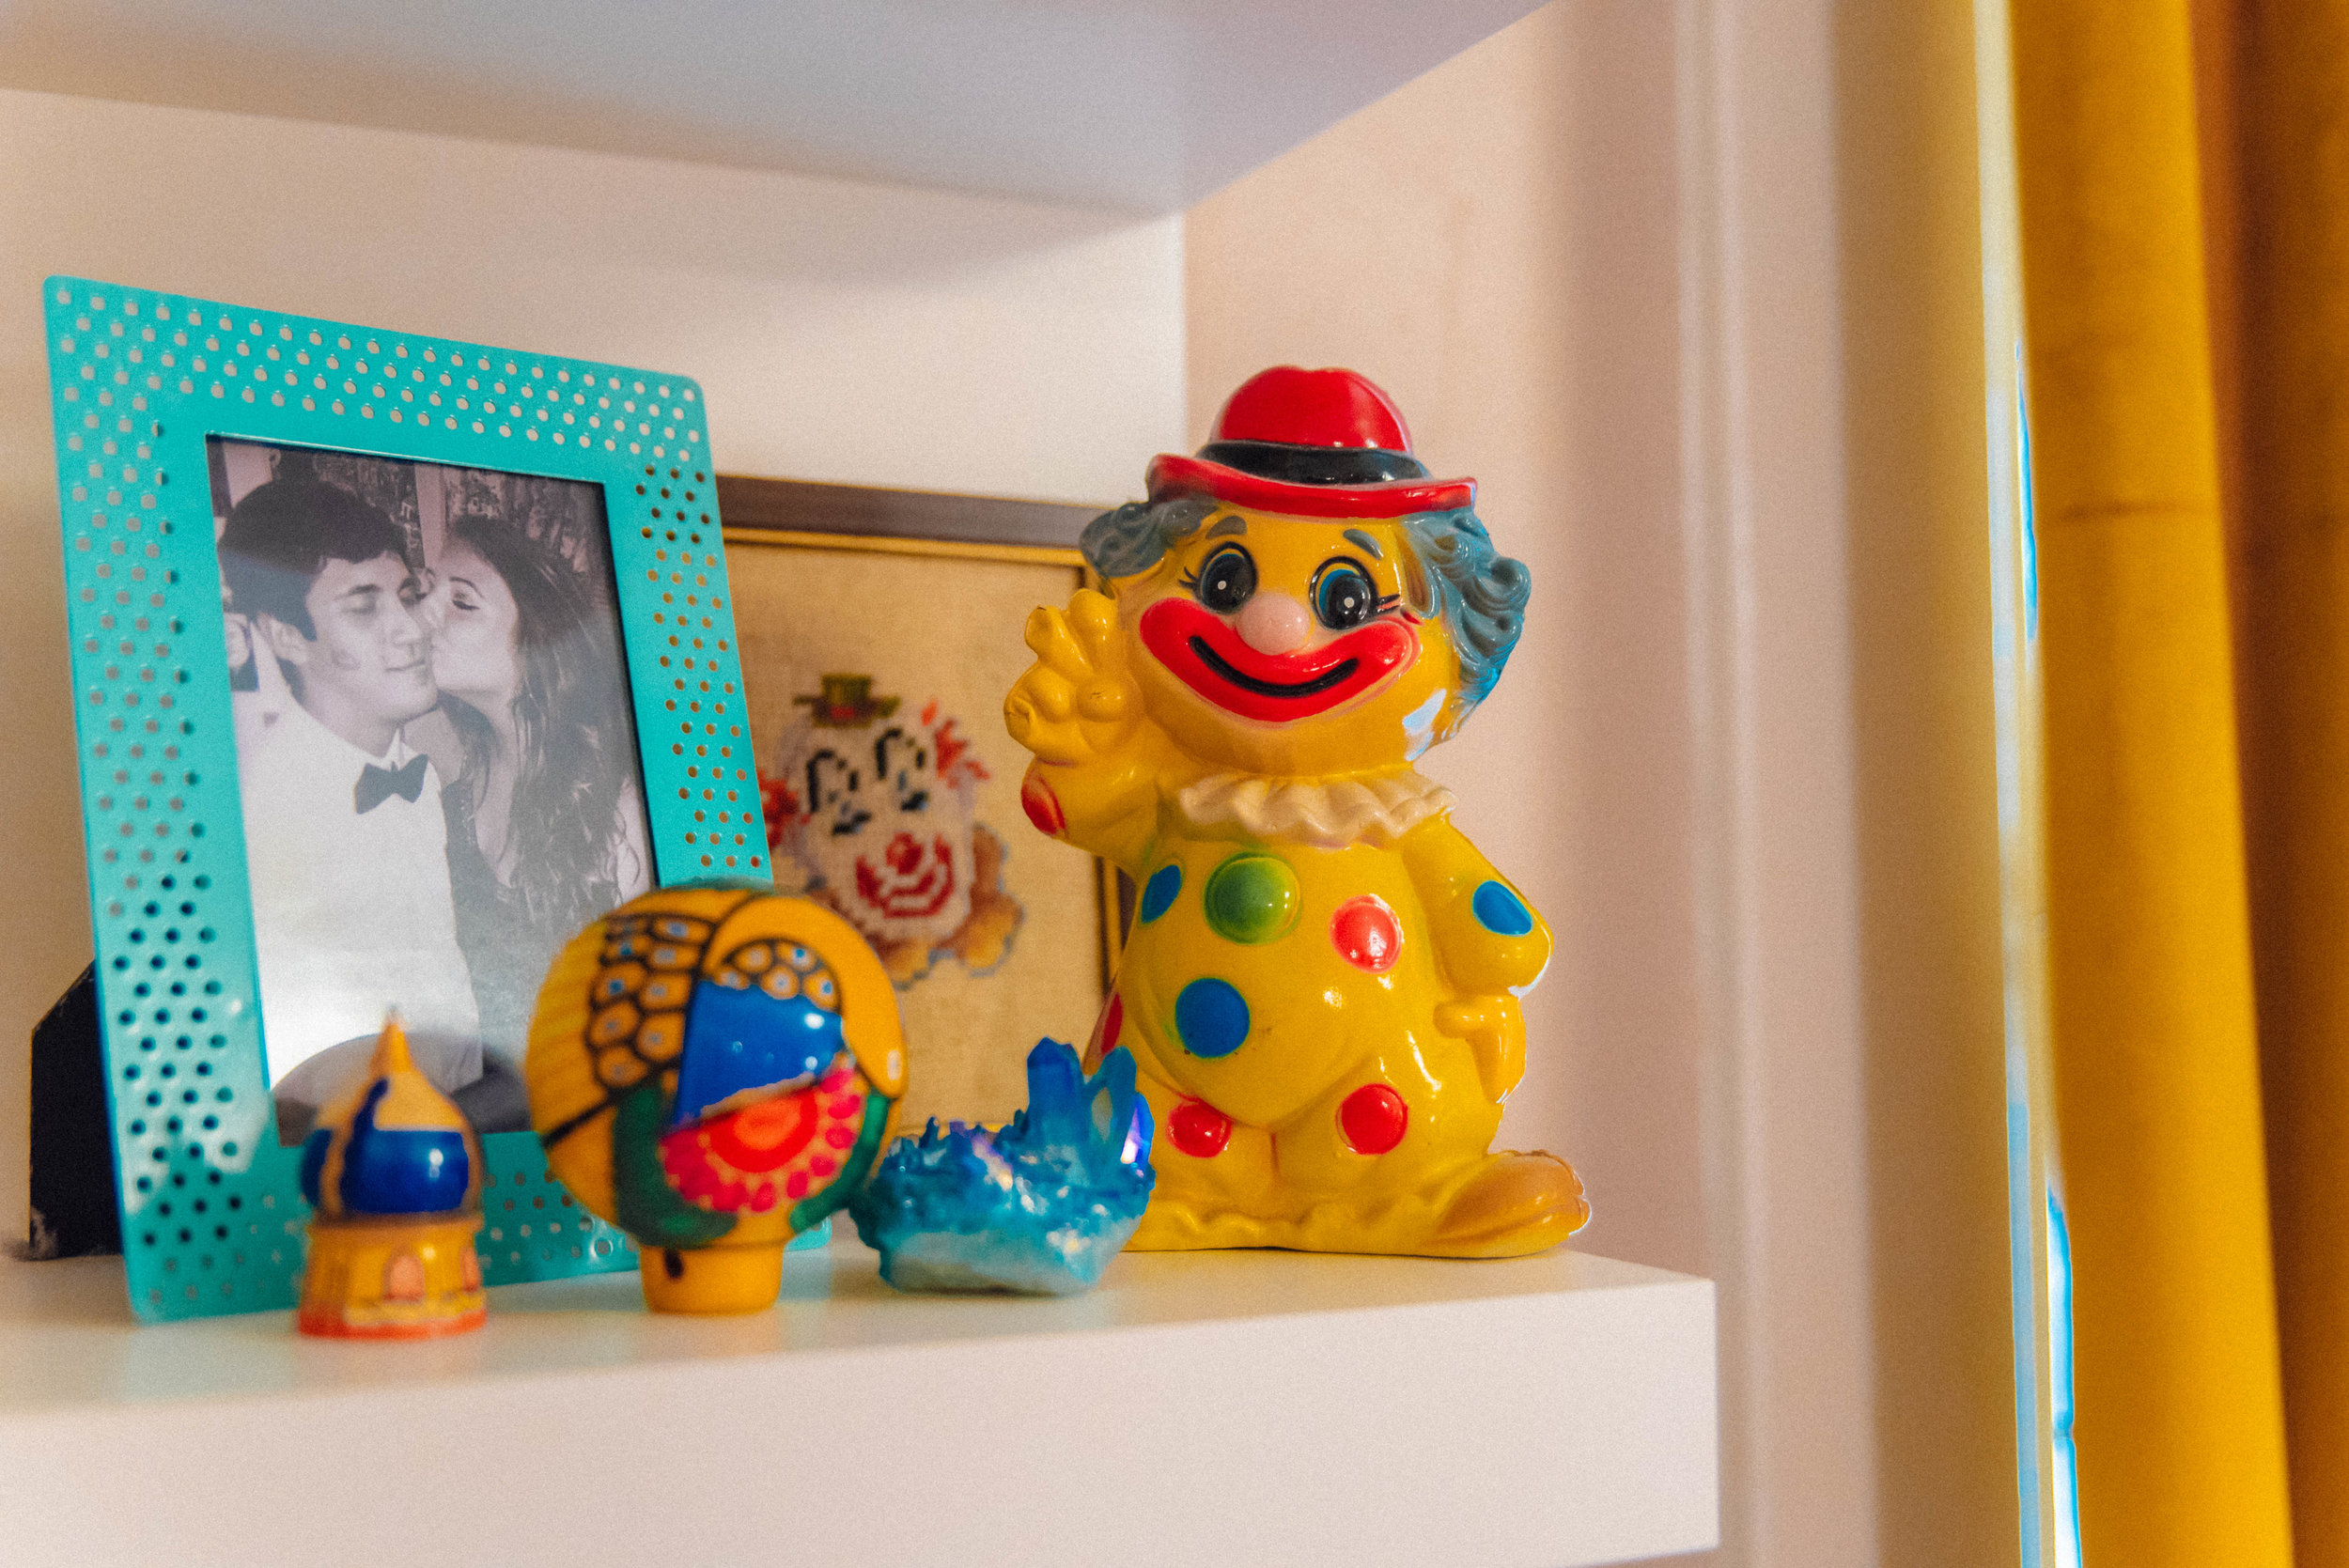 Jordan Hefler's clown collection